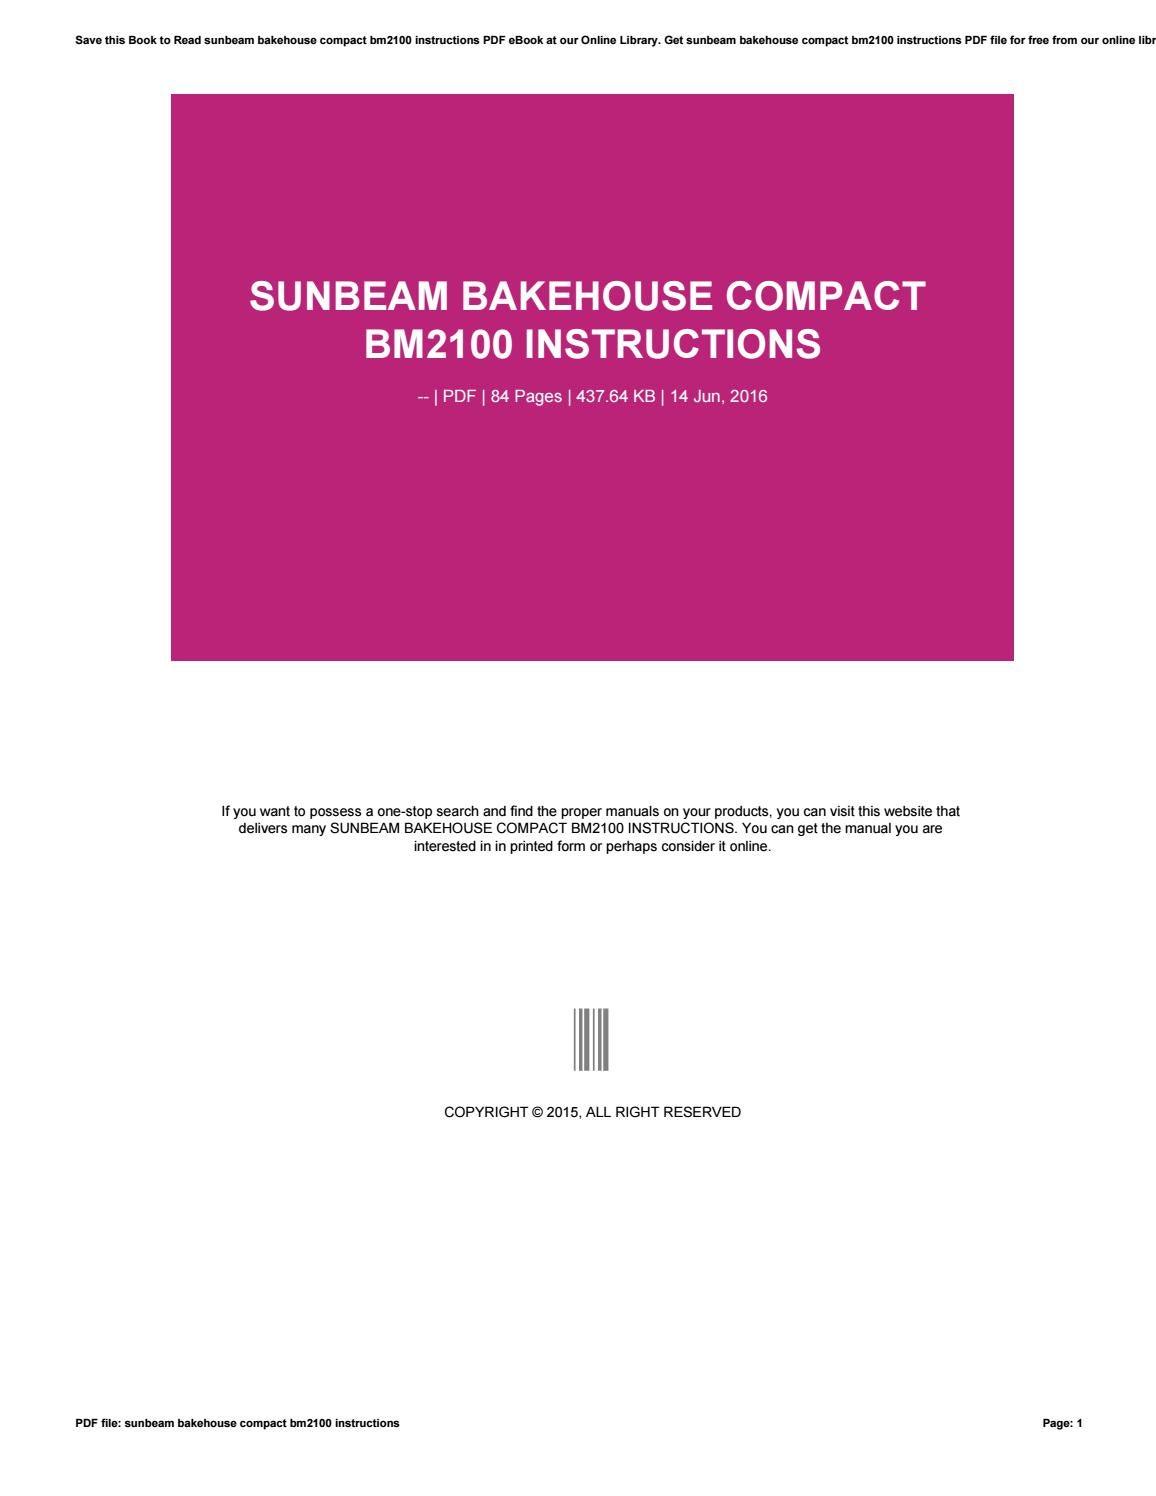 sunbeam bakehouse compact instructions